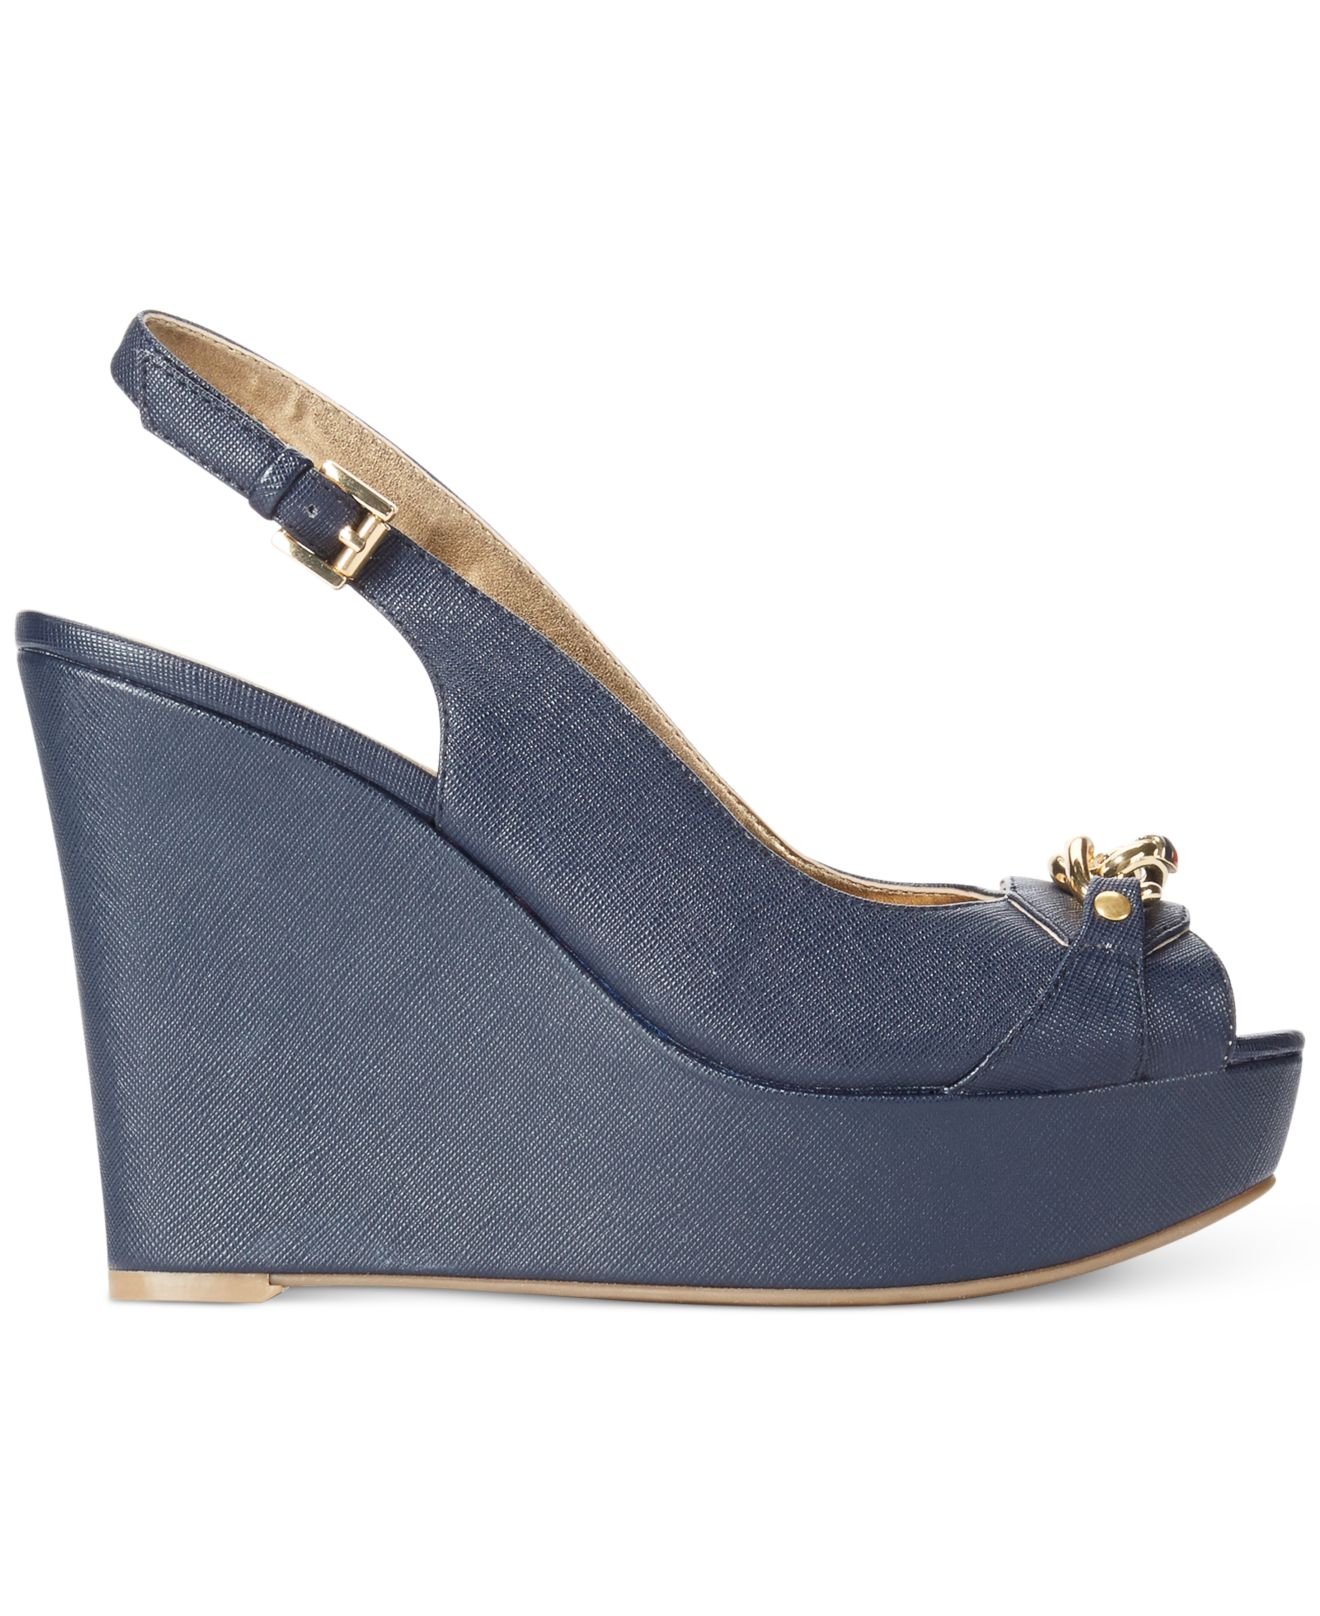 3707a763f6c1 Lyst - Tommy Hilfiger Women S Mercedi Platform Wedge Sandals in Blue